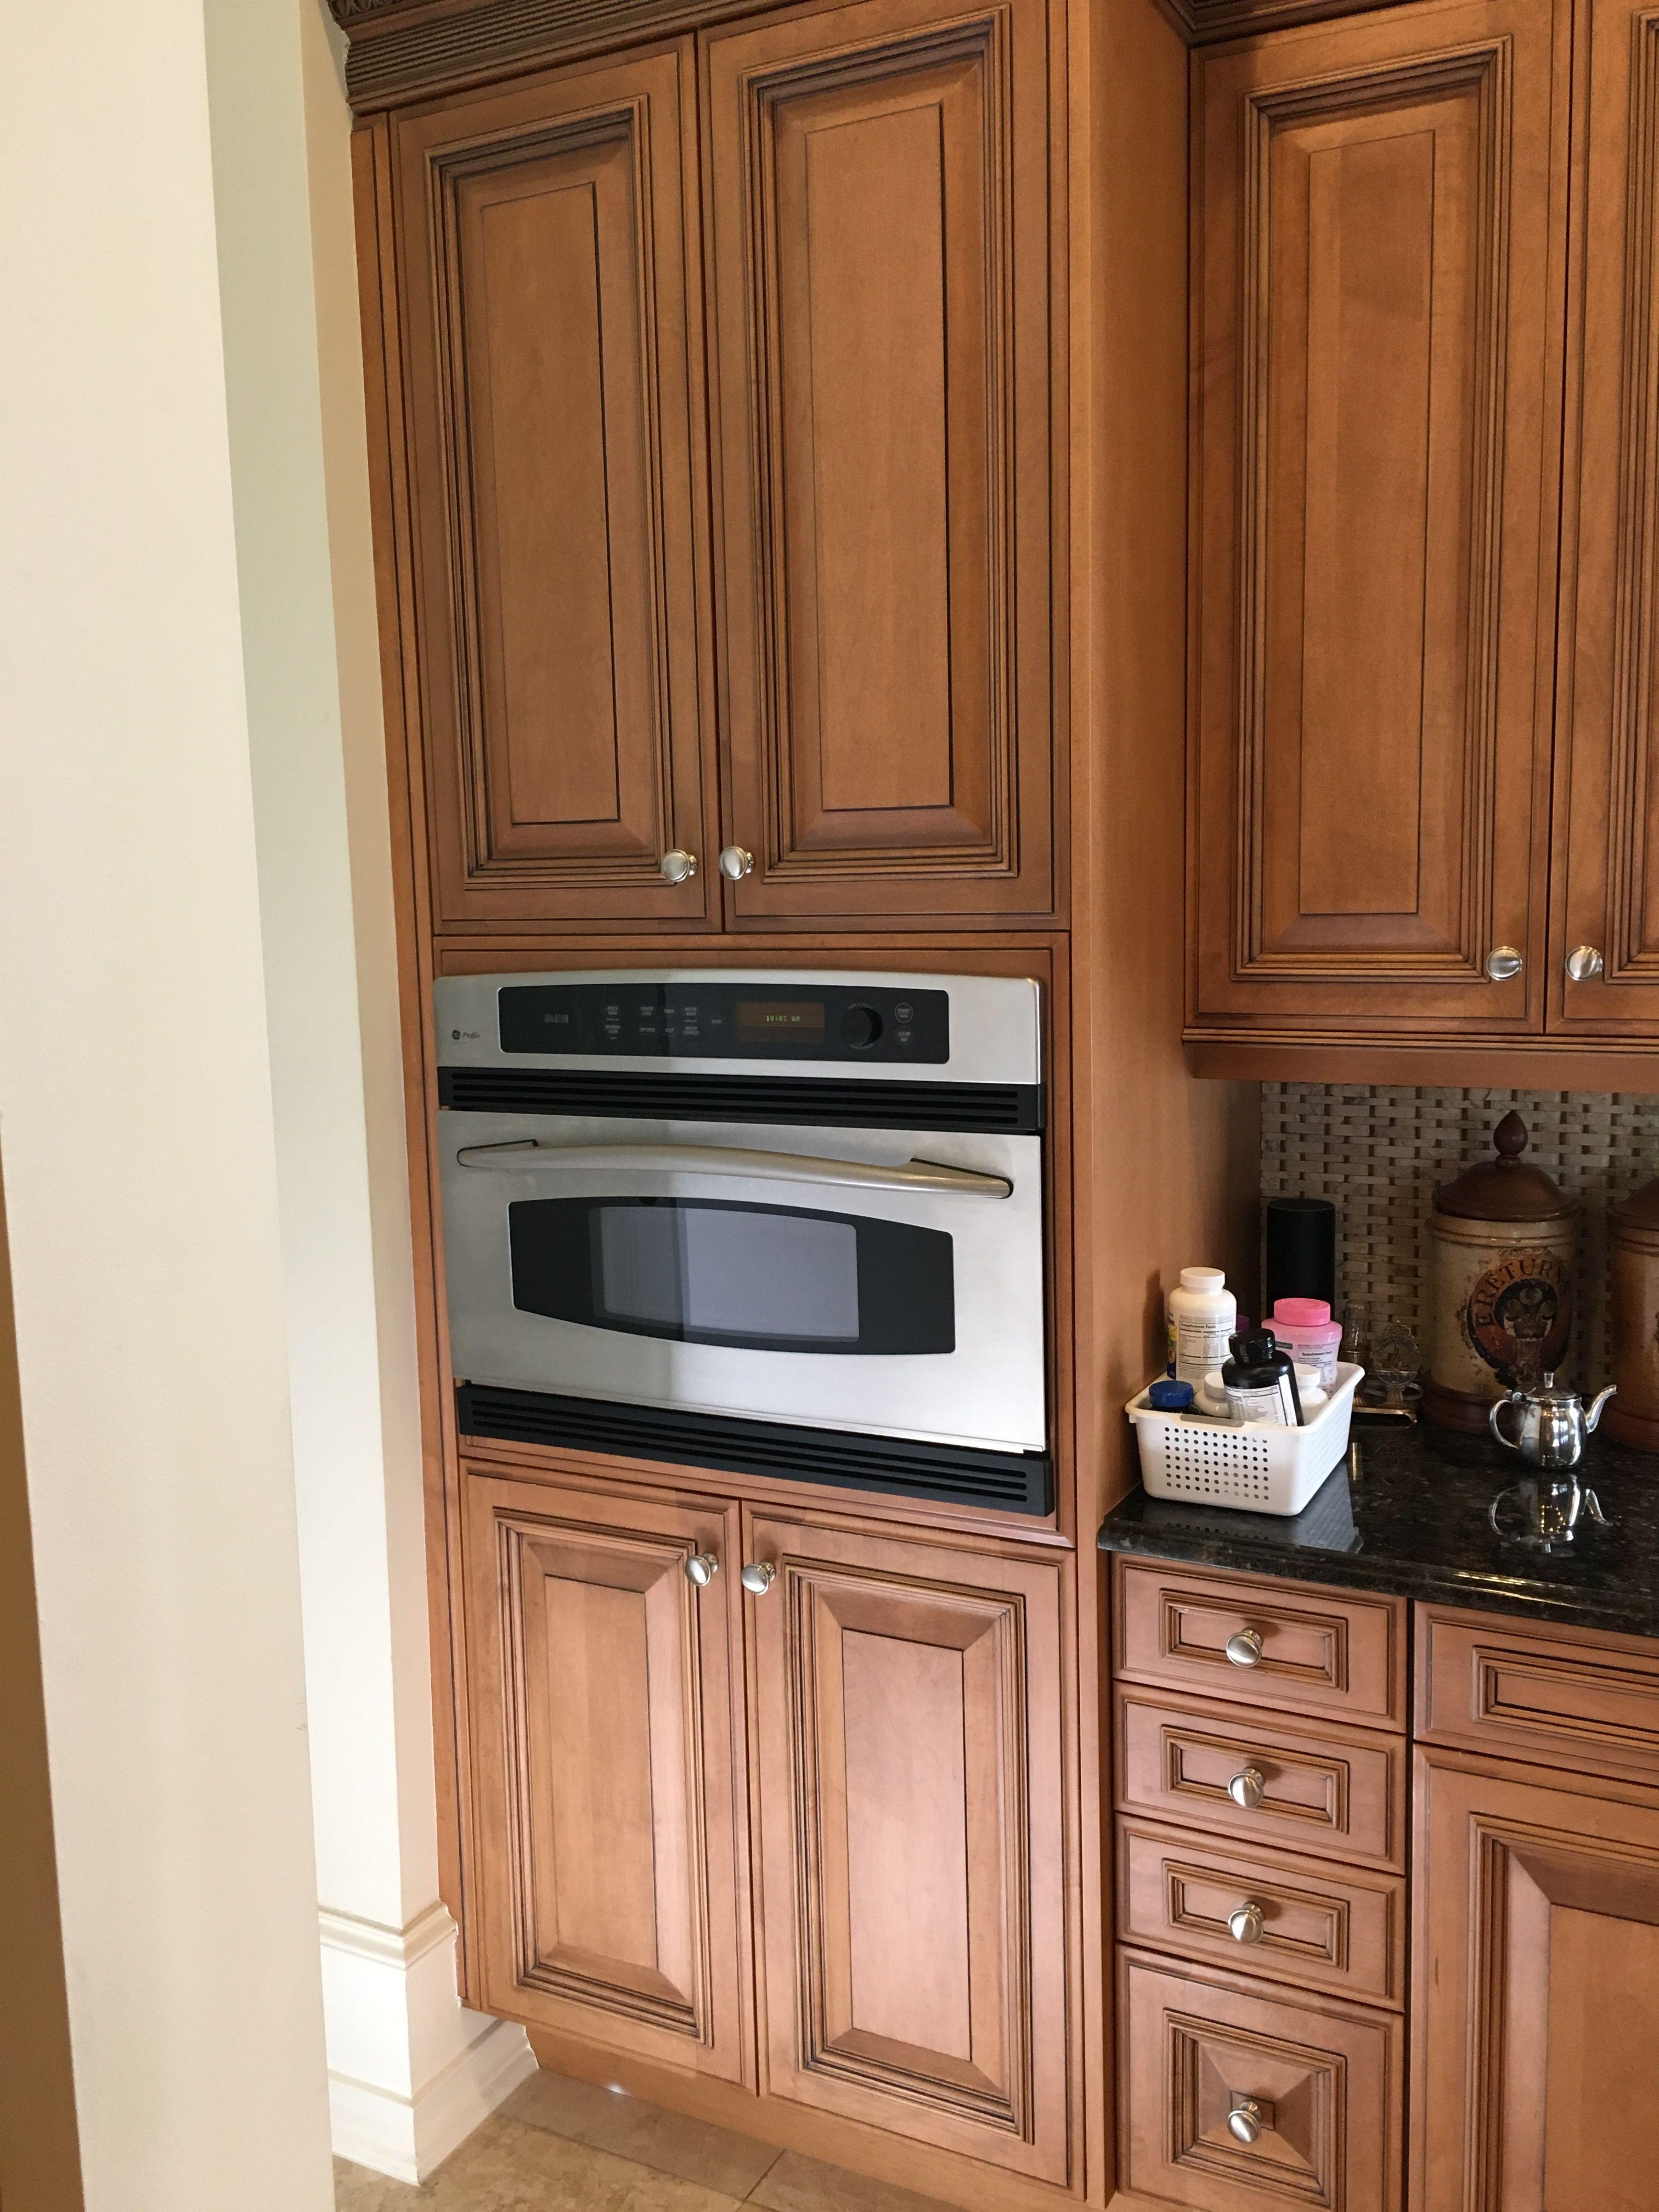 RG: My Advantium Oven In FL At U201ccounteru201d Height   Hilton ...